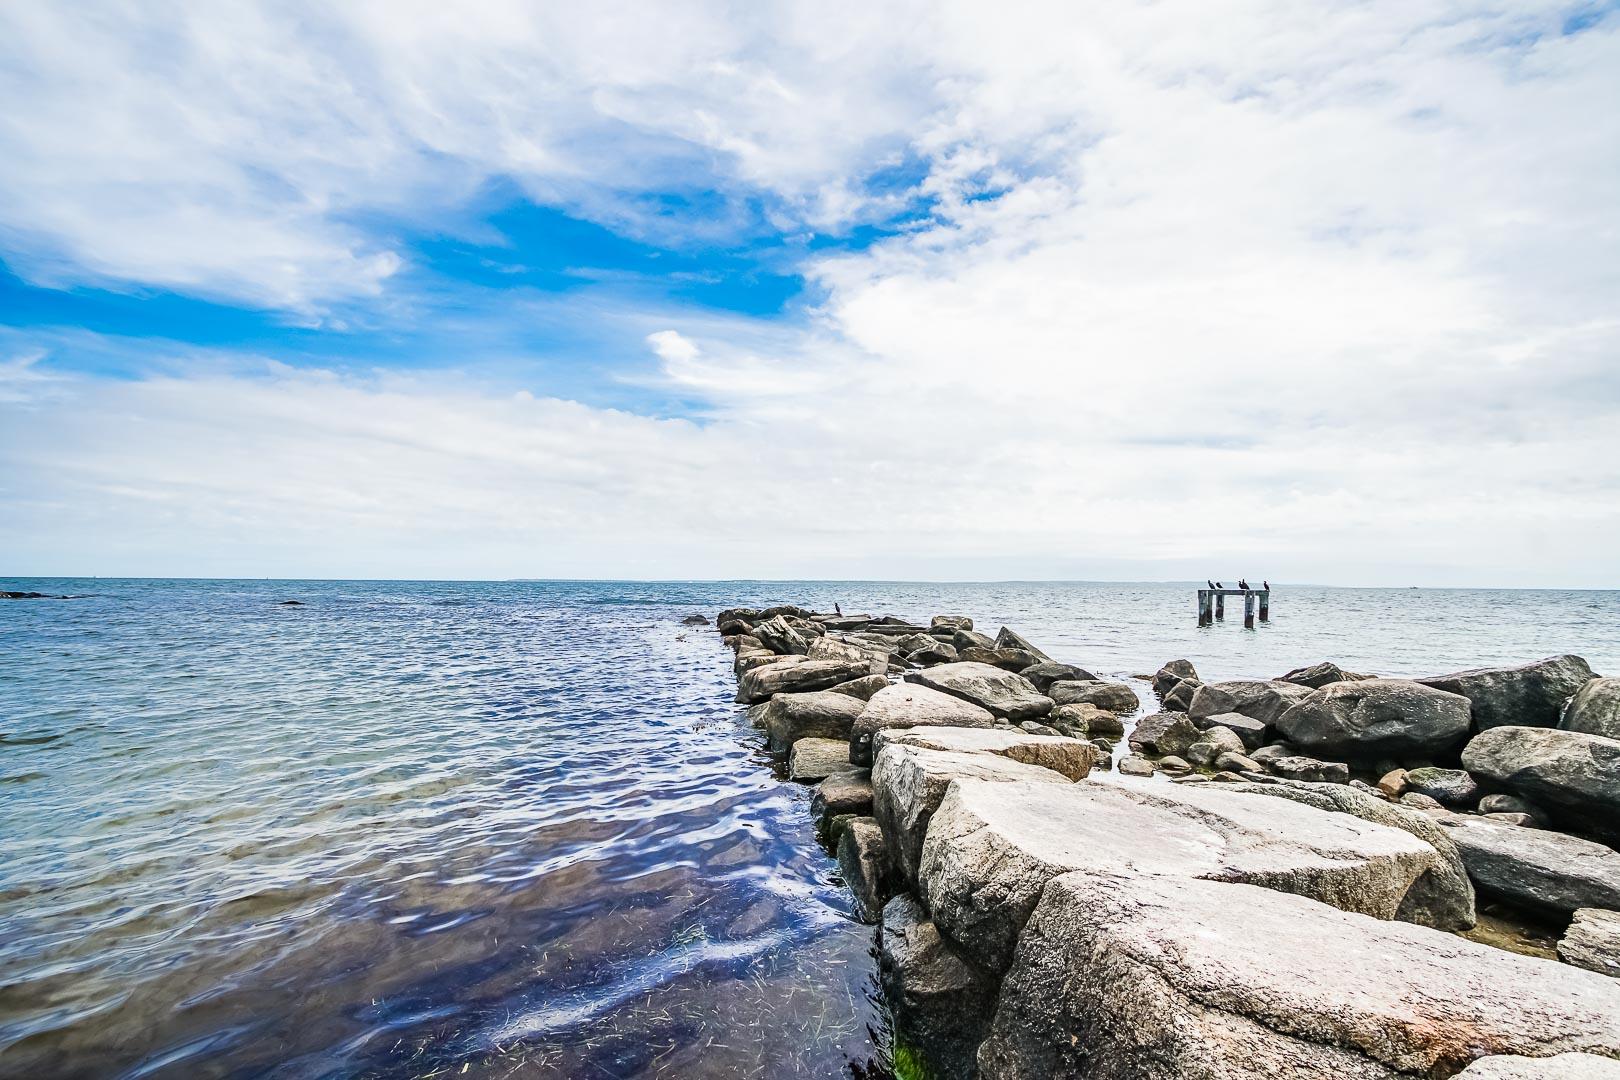 A peaceful ocean view at VRI's Beachside Village Resort in Massachusetts.